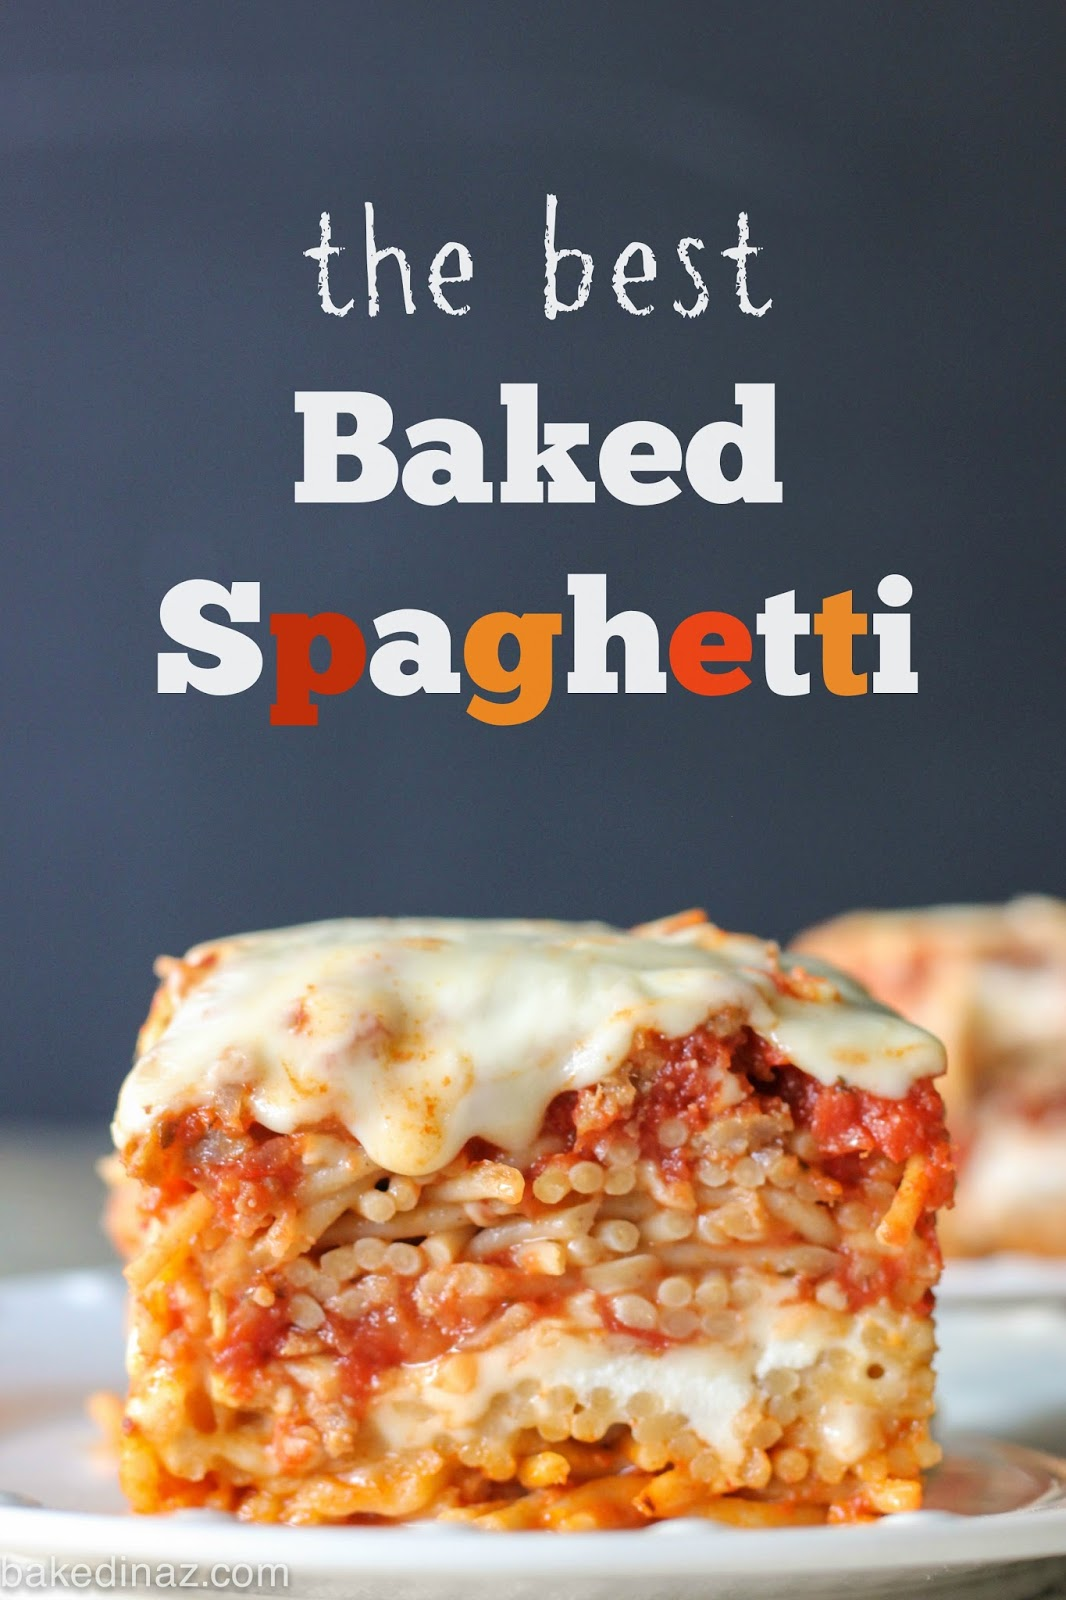 Baked Spaghetti Baked In Az